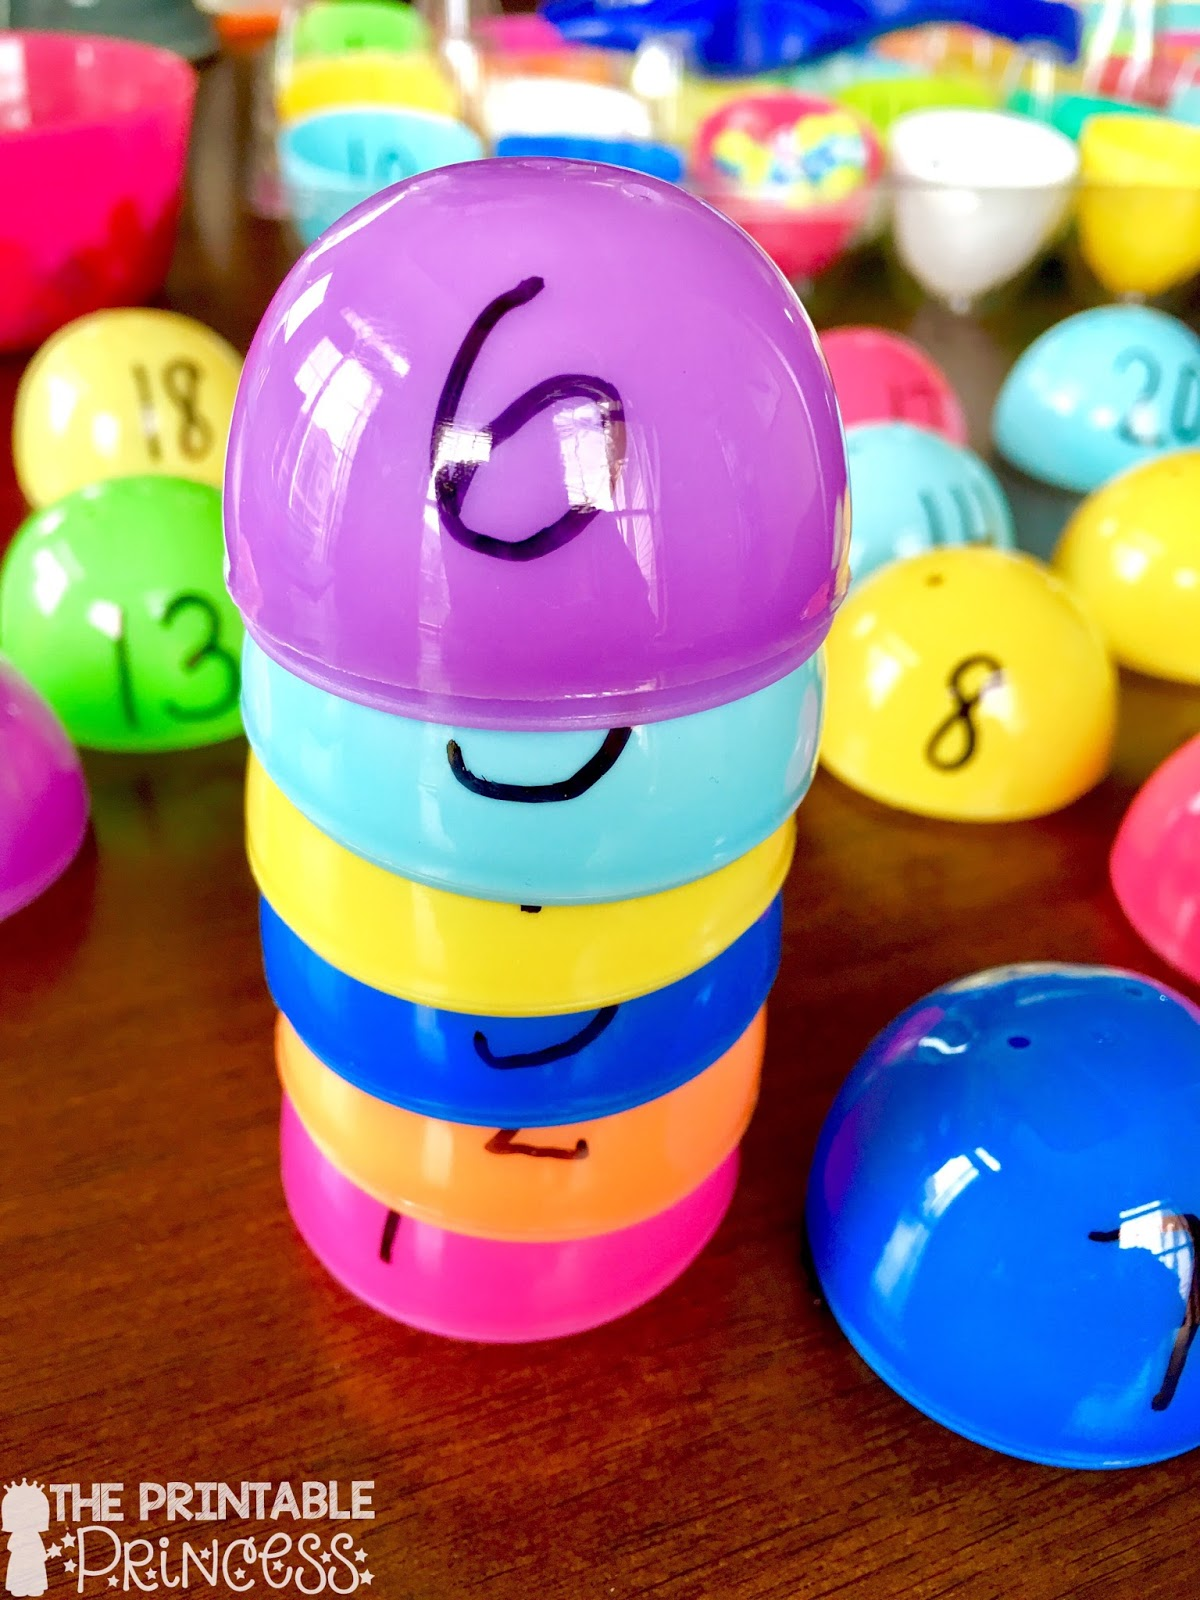 The Printable Princess Easter Egg Math Activities For